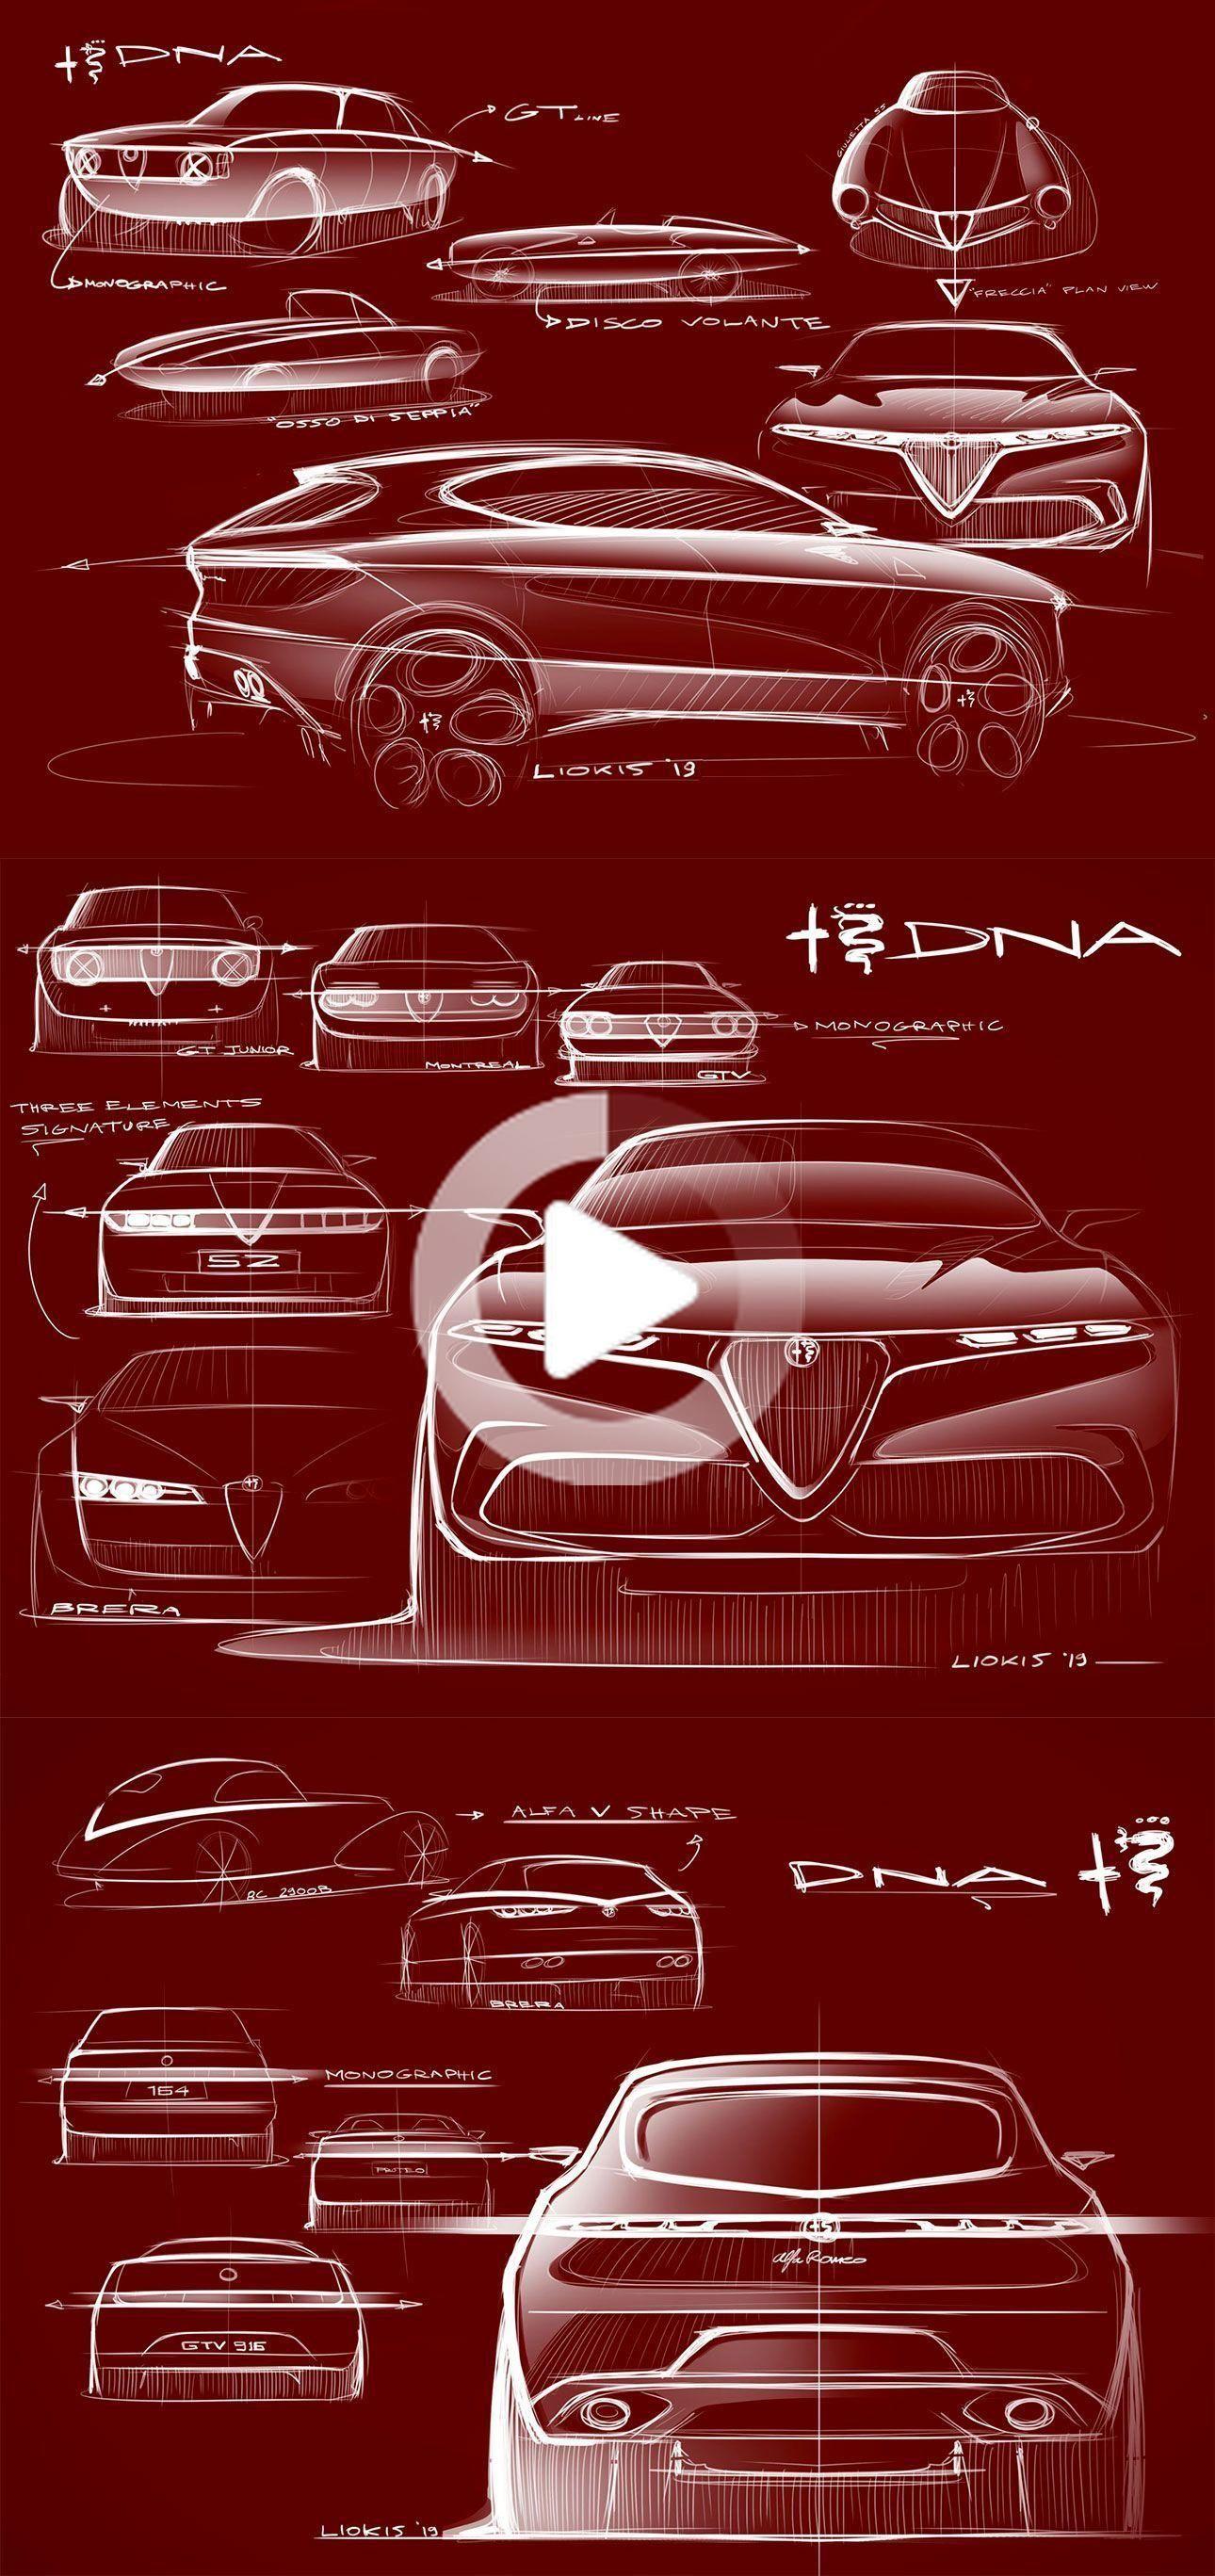 Alfa Romeo Tonale Concept: design sketches by Senior Exterior Designer Alexandros Liokis #AlfaRomeo #SUV #Design #conceptcar #cardesign #conceptcars #futuristiccars #design #futuristic #autodesign #automotive #car #automotivedesign #cargram #sketch #designsketch #carsketch #cardesignsketch #industrialdesignsketch #cardesignworld #cardesignercommunity #cardesignpro #carbodydesign #carrendering #cars #carideas